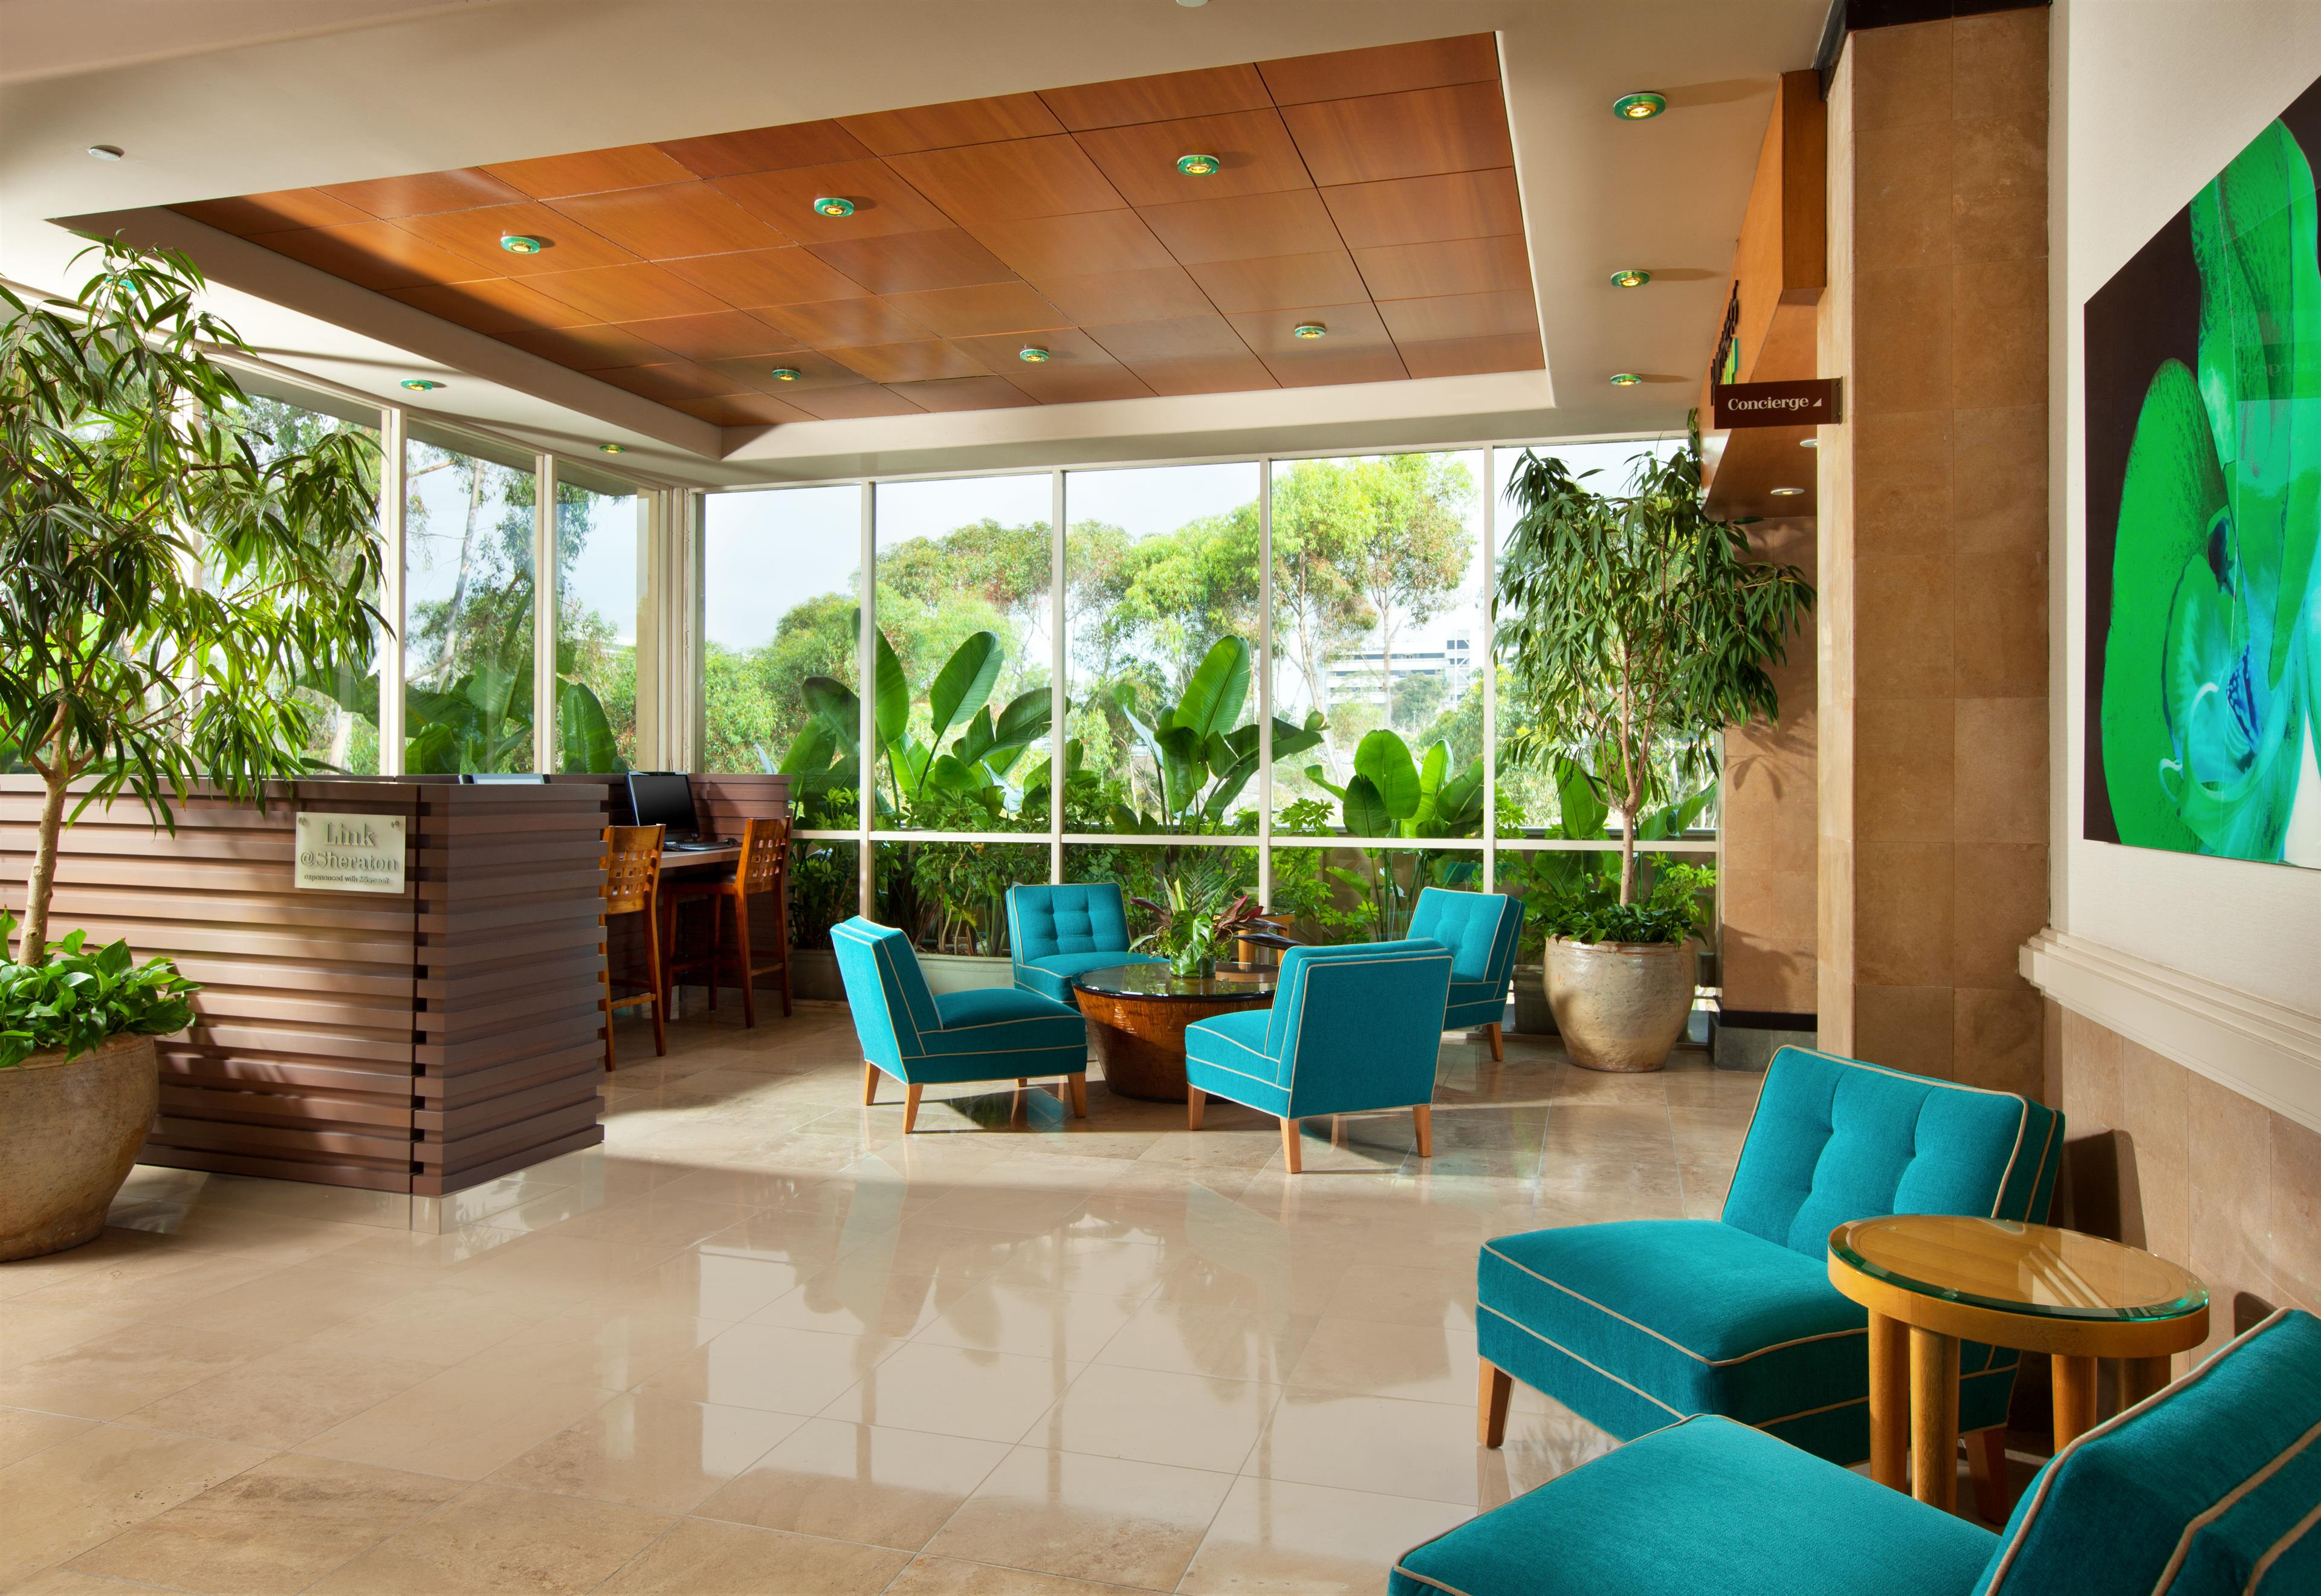 Sheraton La Jolla Hotel image 1